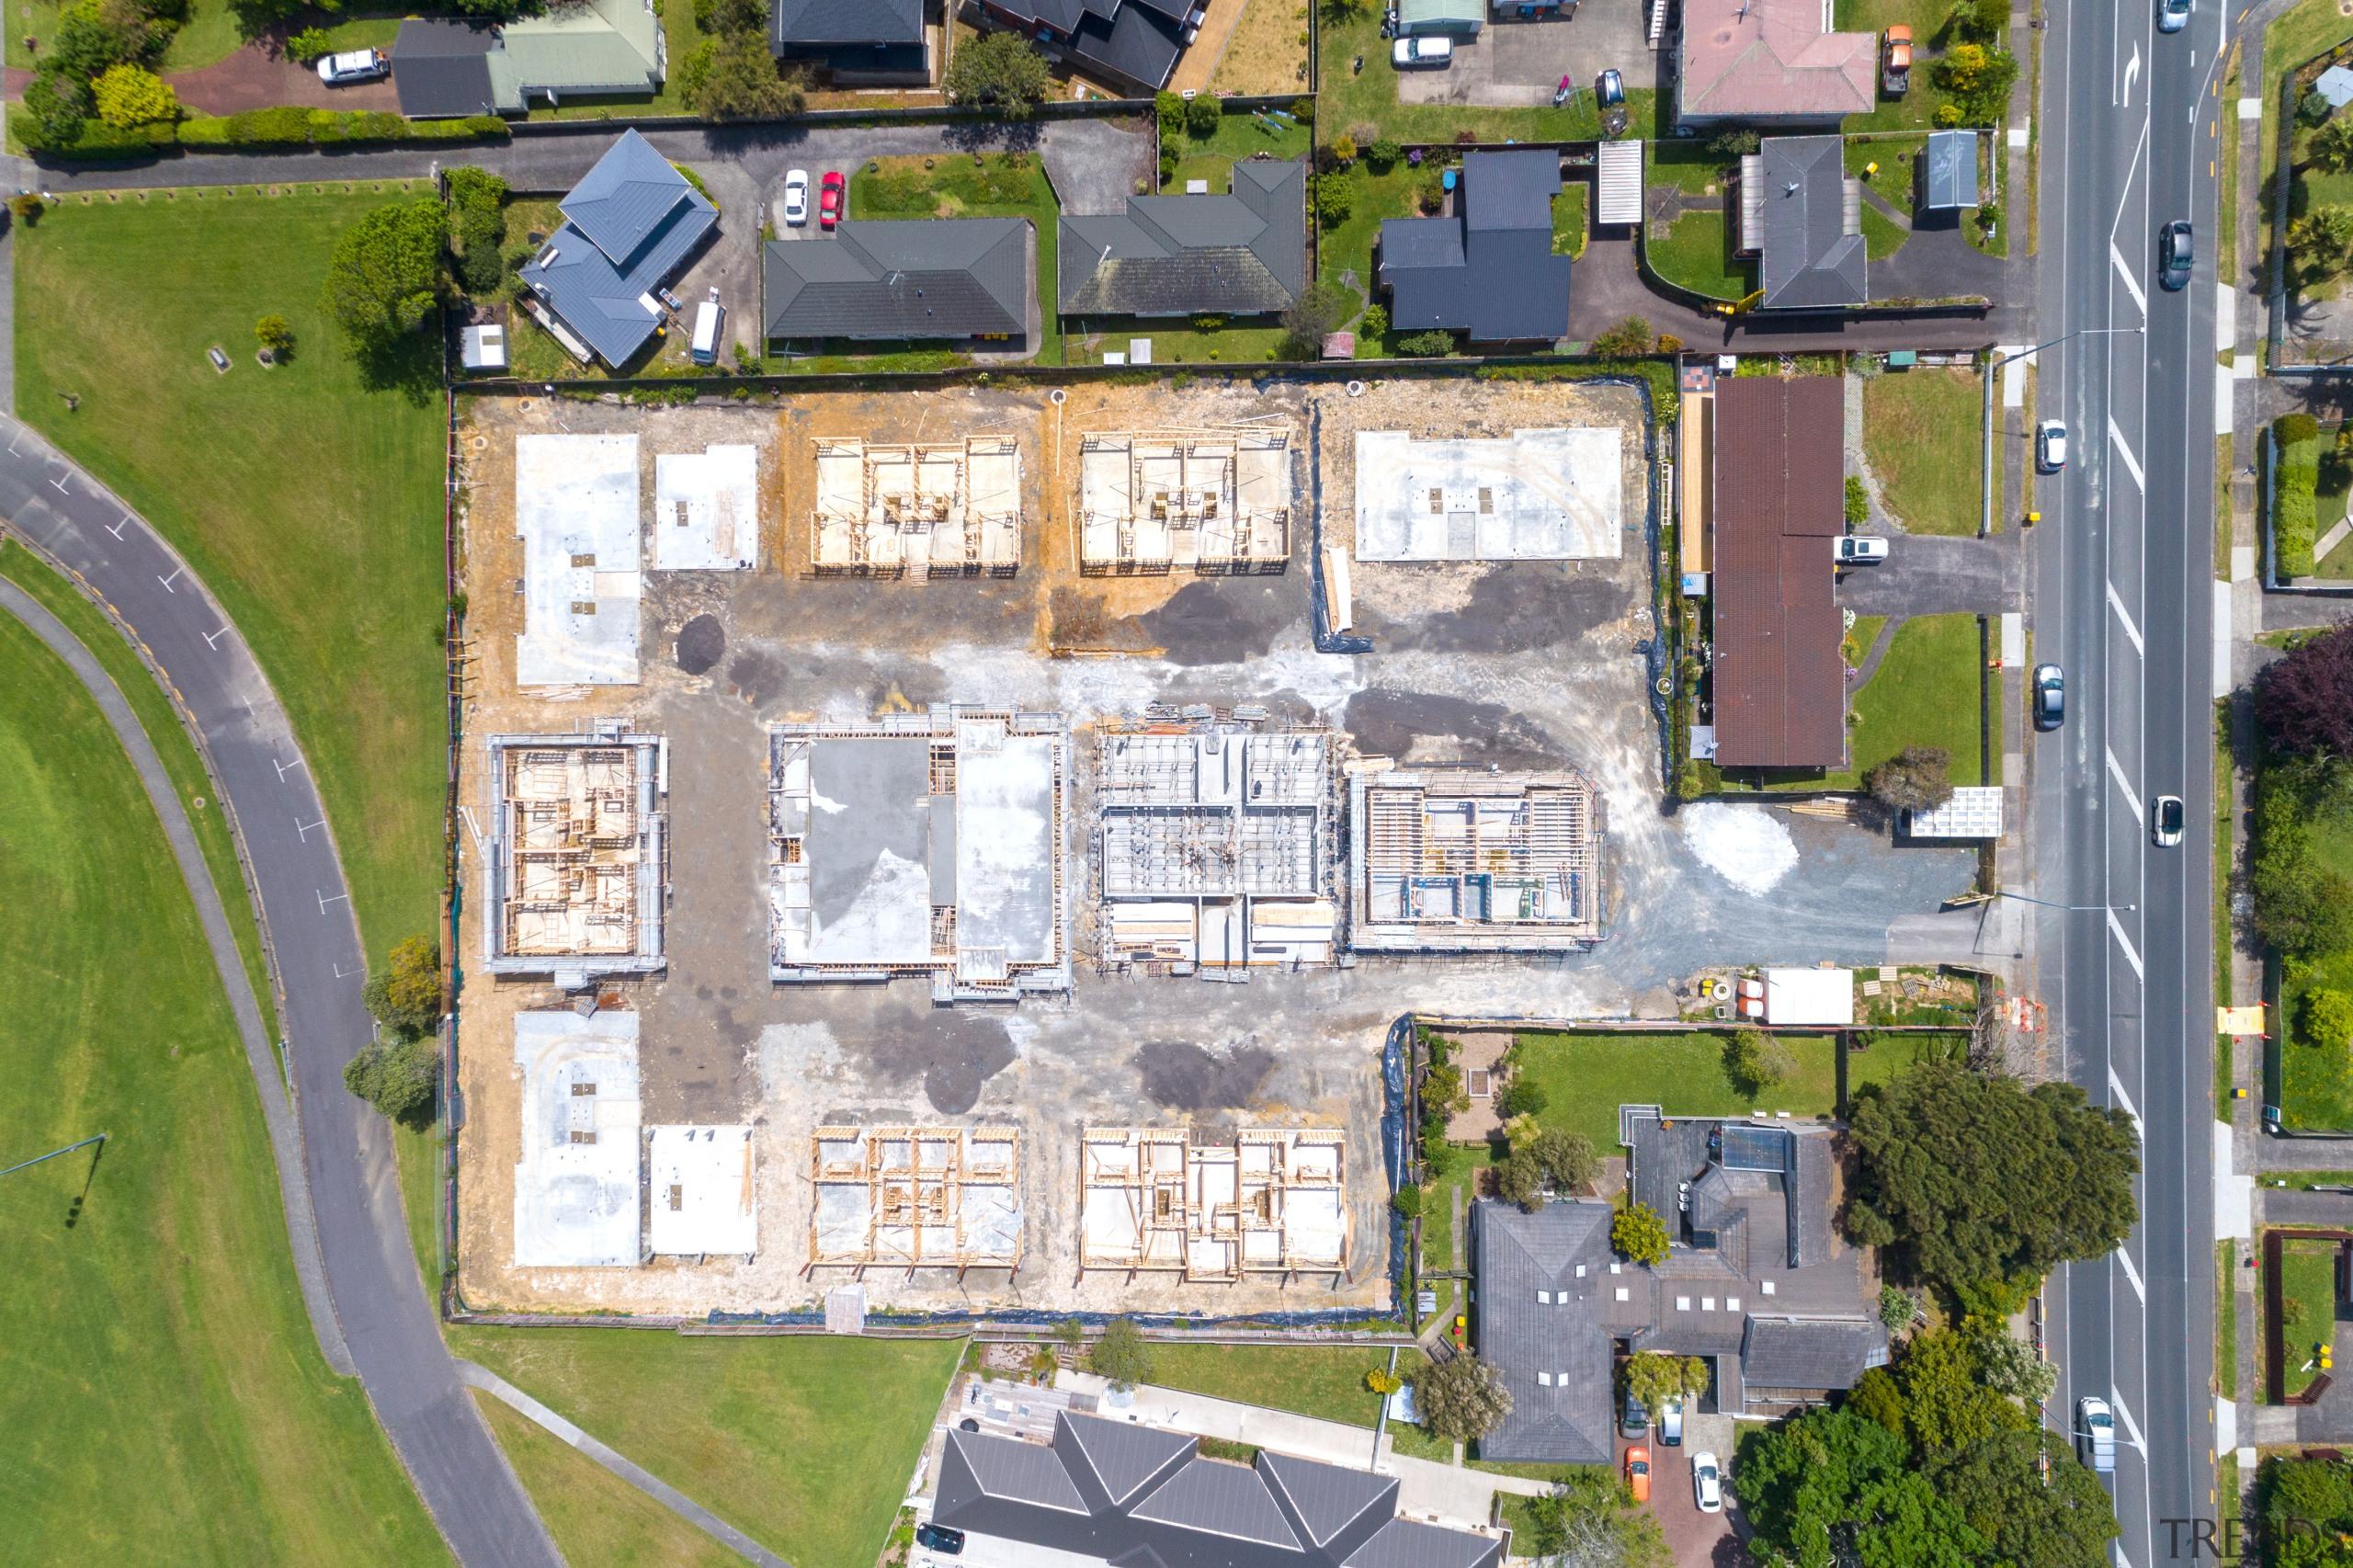 The new Treasure Plus development by EZ Building white